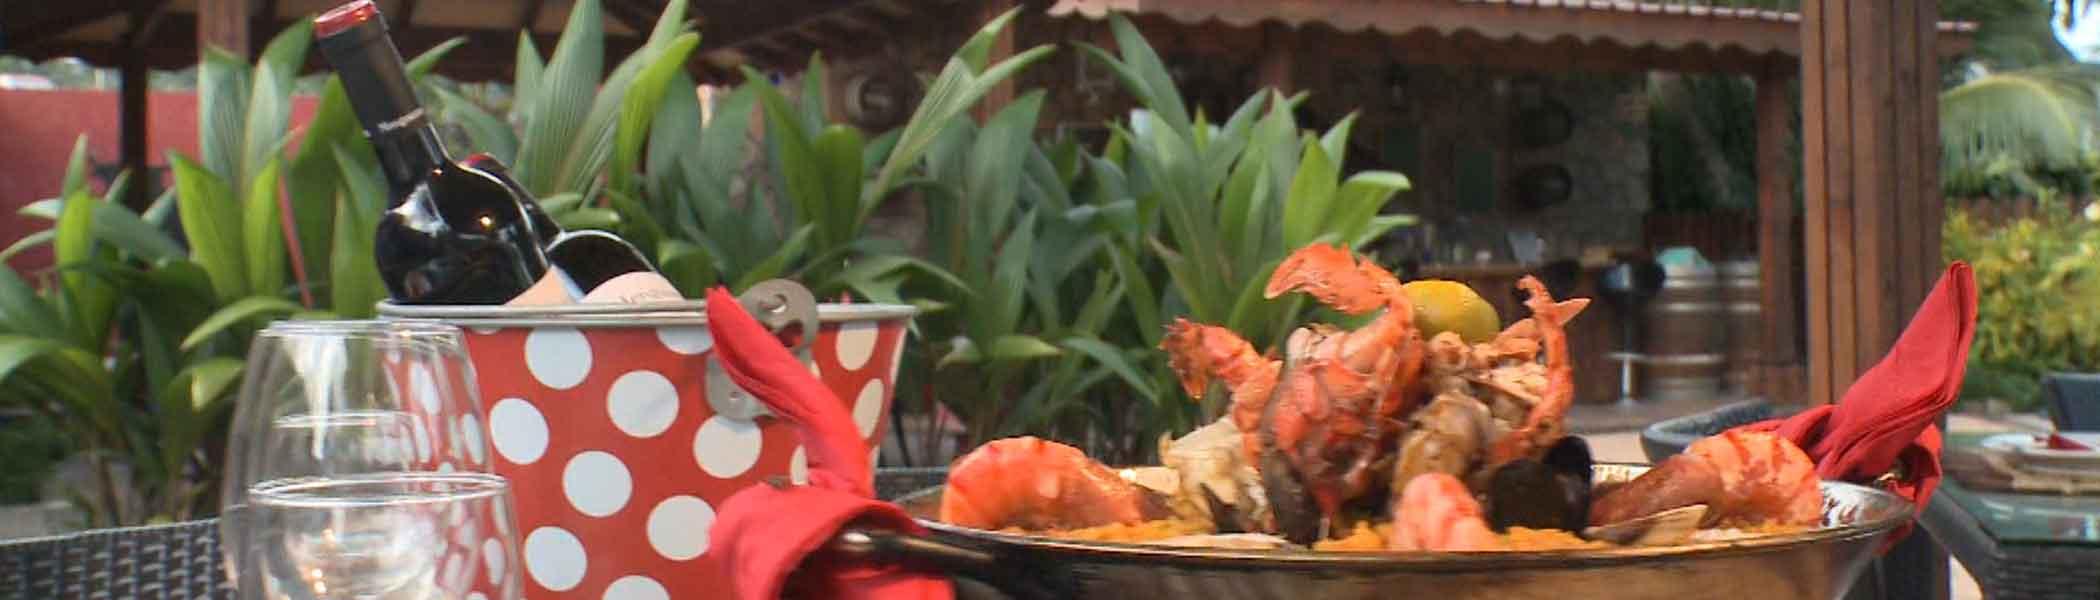 ole-restaurant, Bars and restaurants in Seychelles Islands